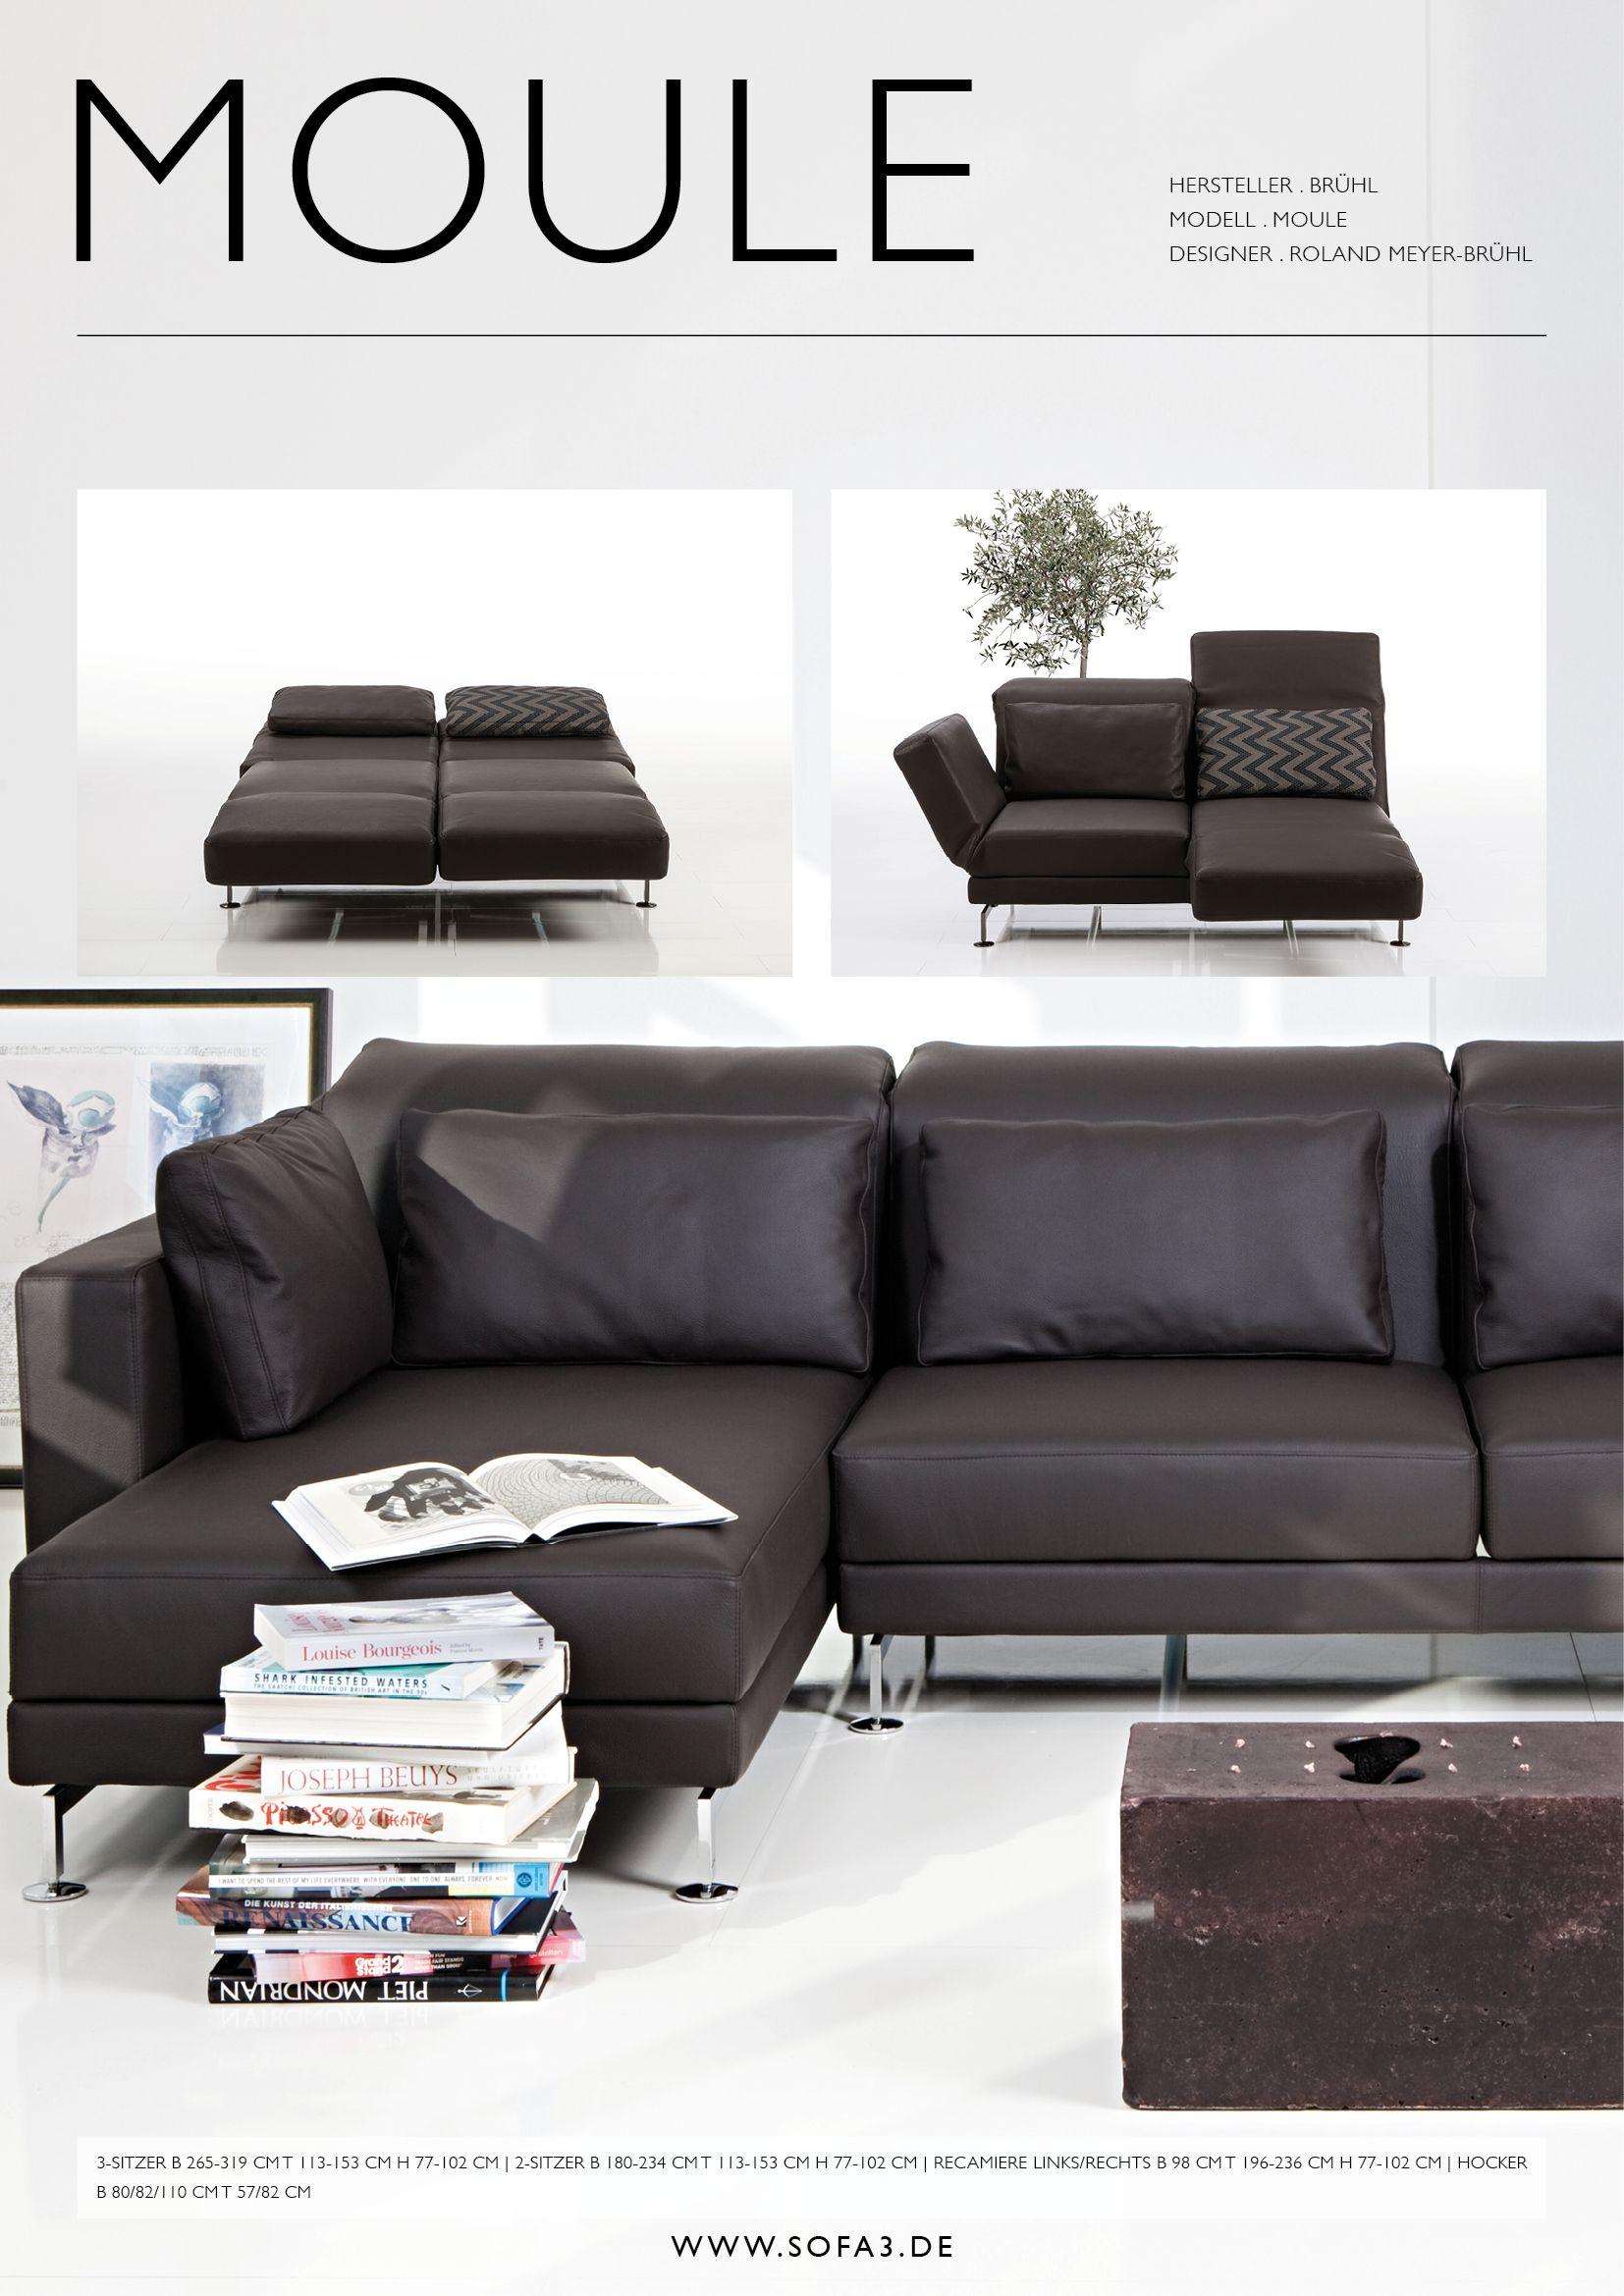 moule brühl bruehl roland meyer brühl sofas sofa sofa3